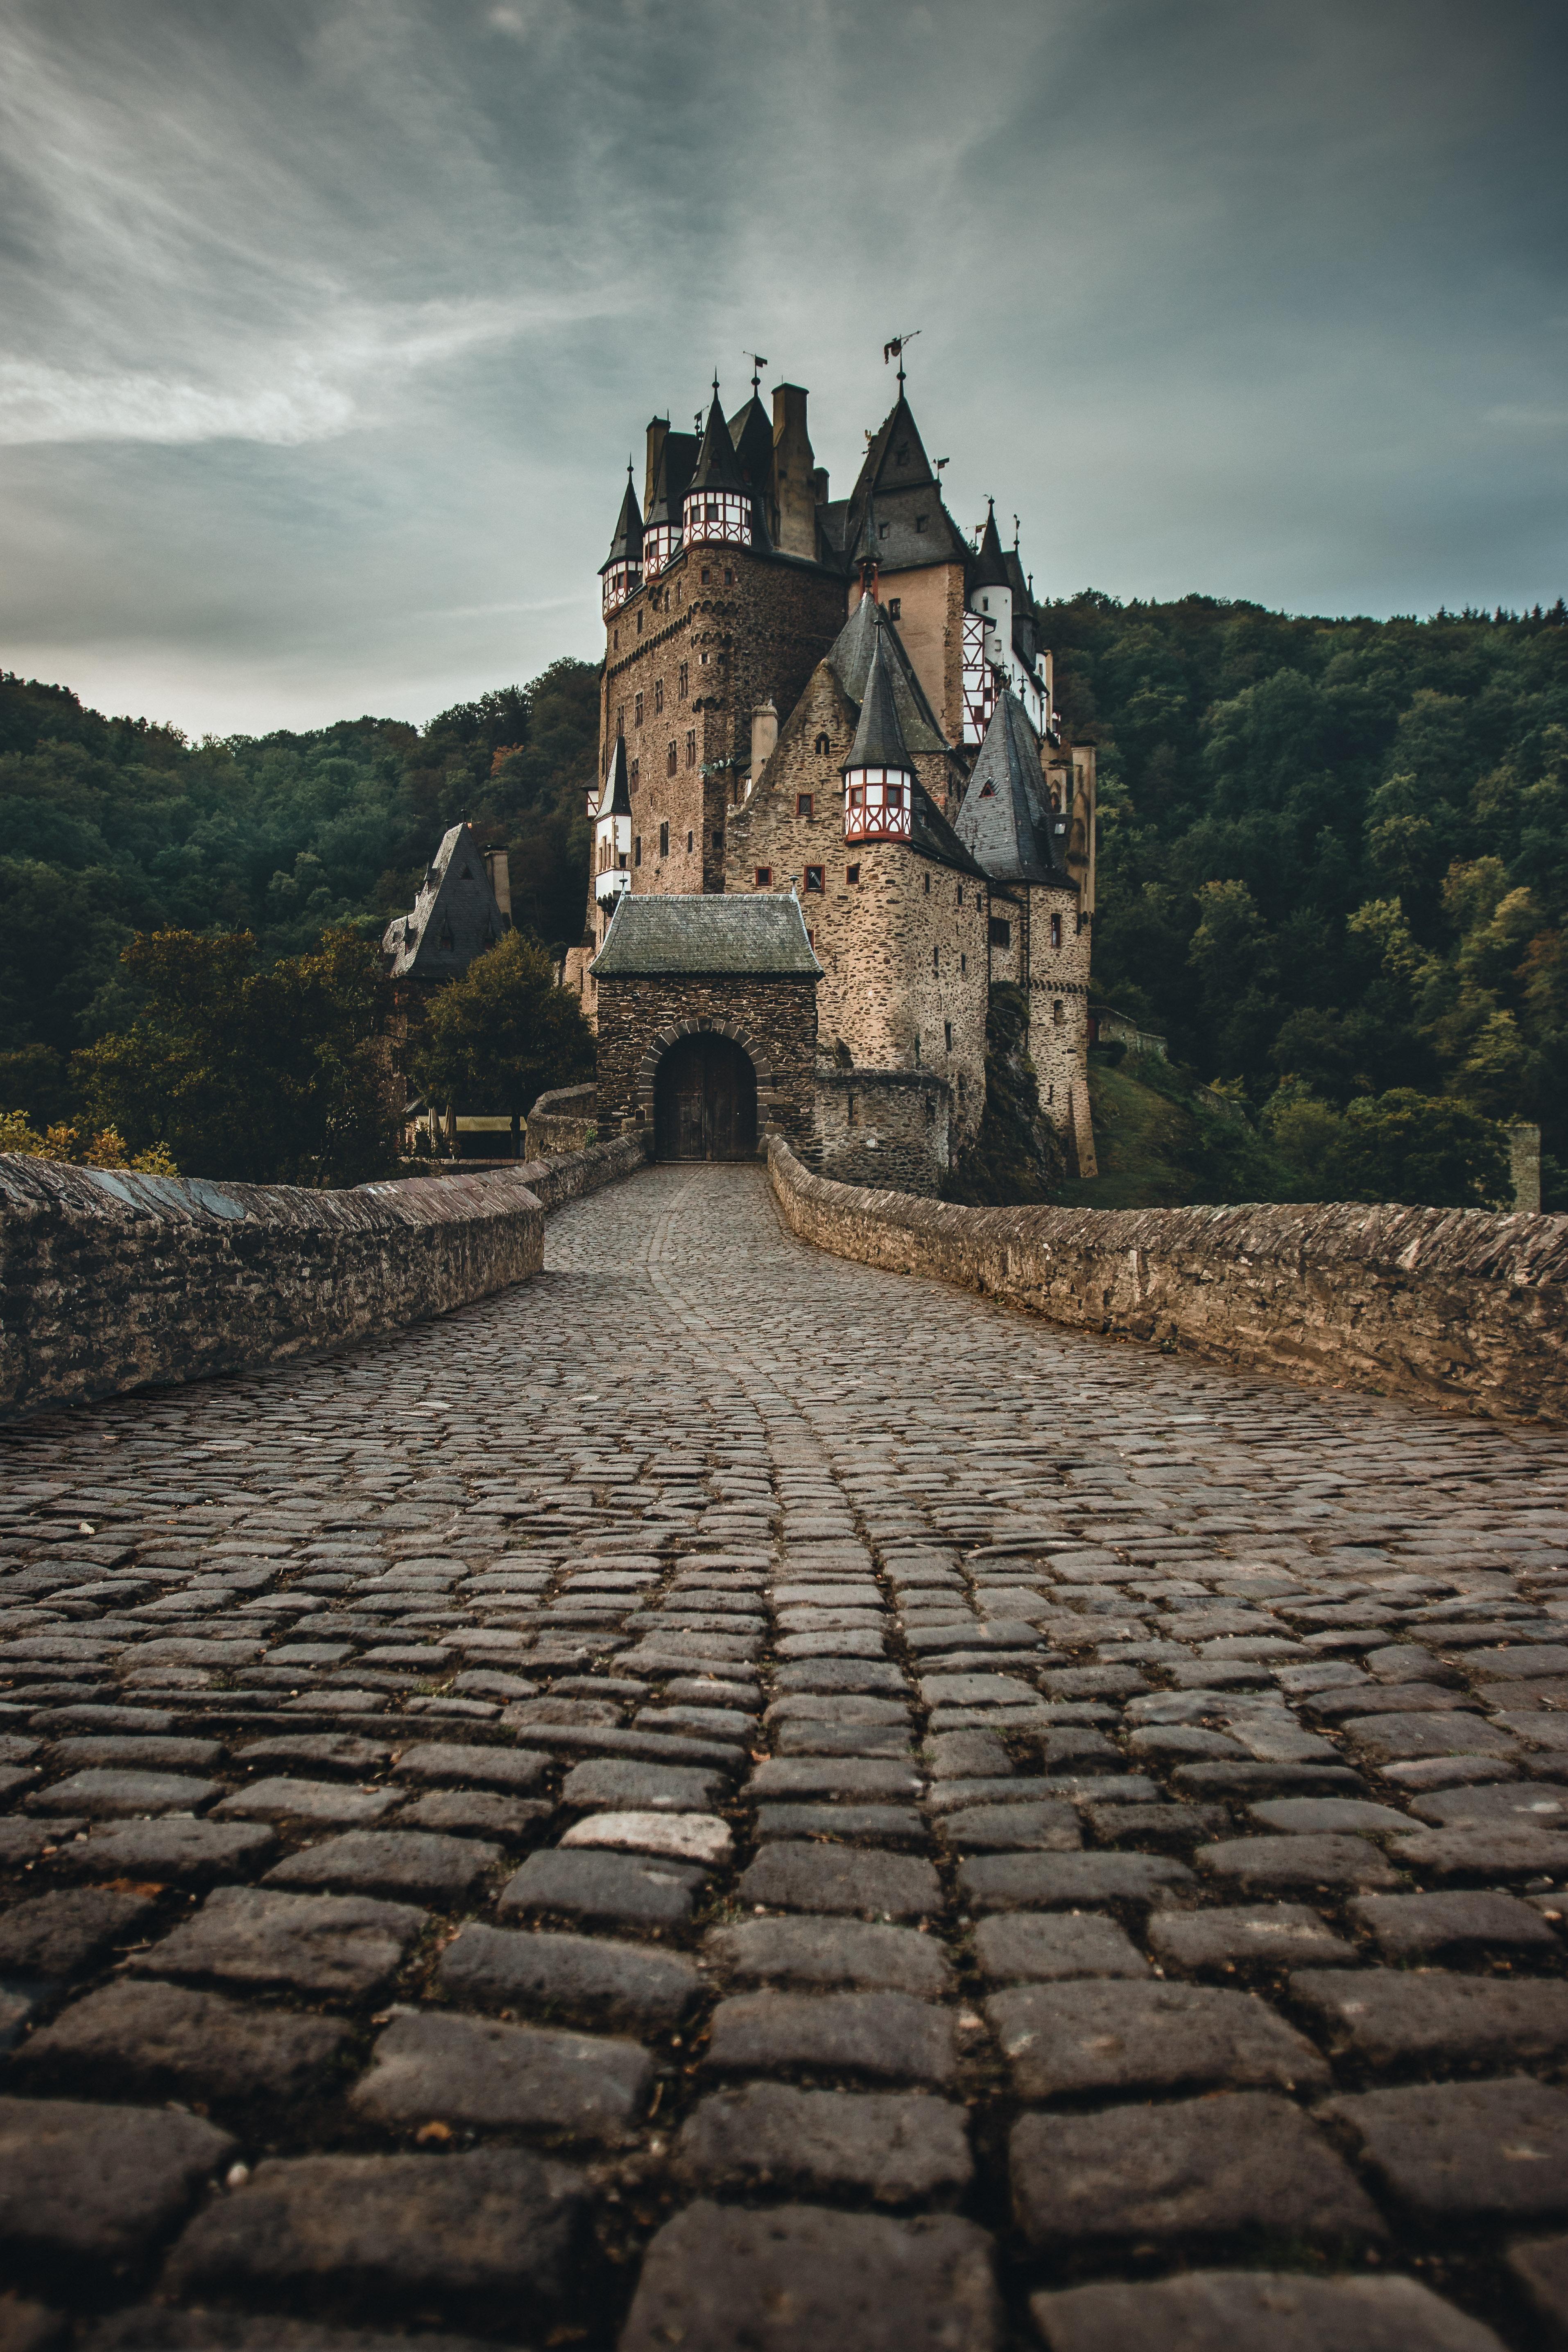 Burg Eltz In Germany Oc 3829 5743 Germany Castles Burg Eltz Castle Castle